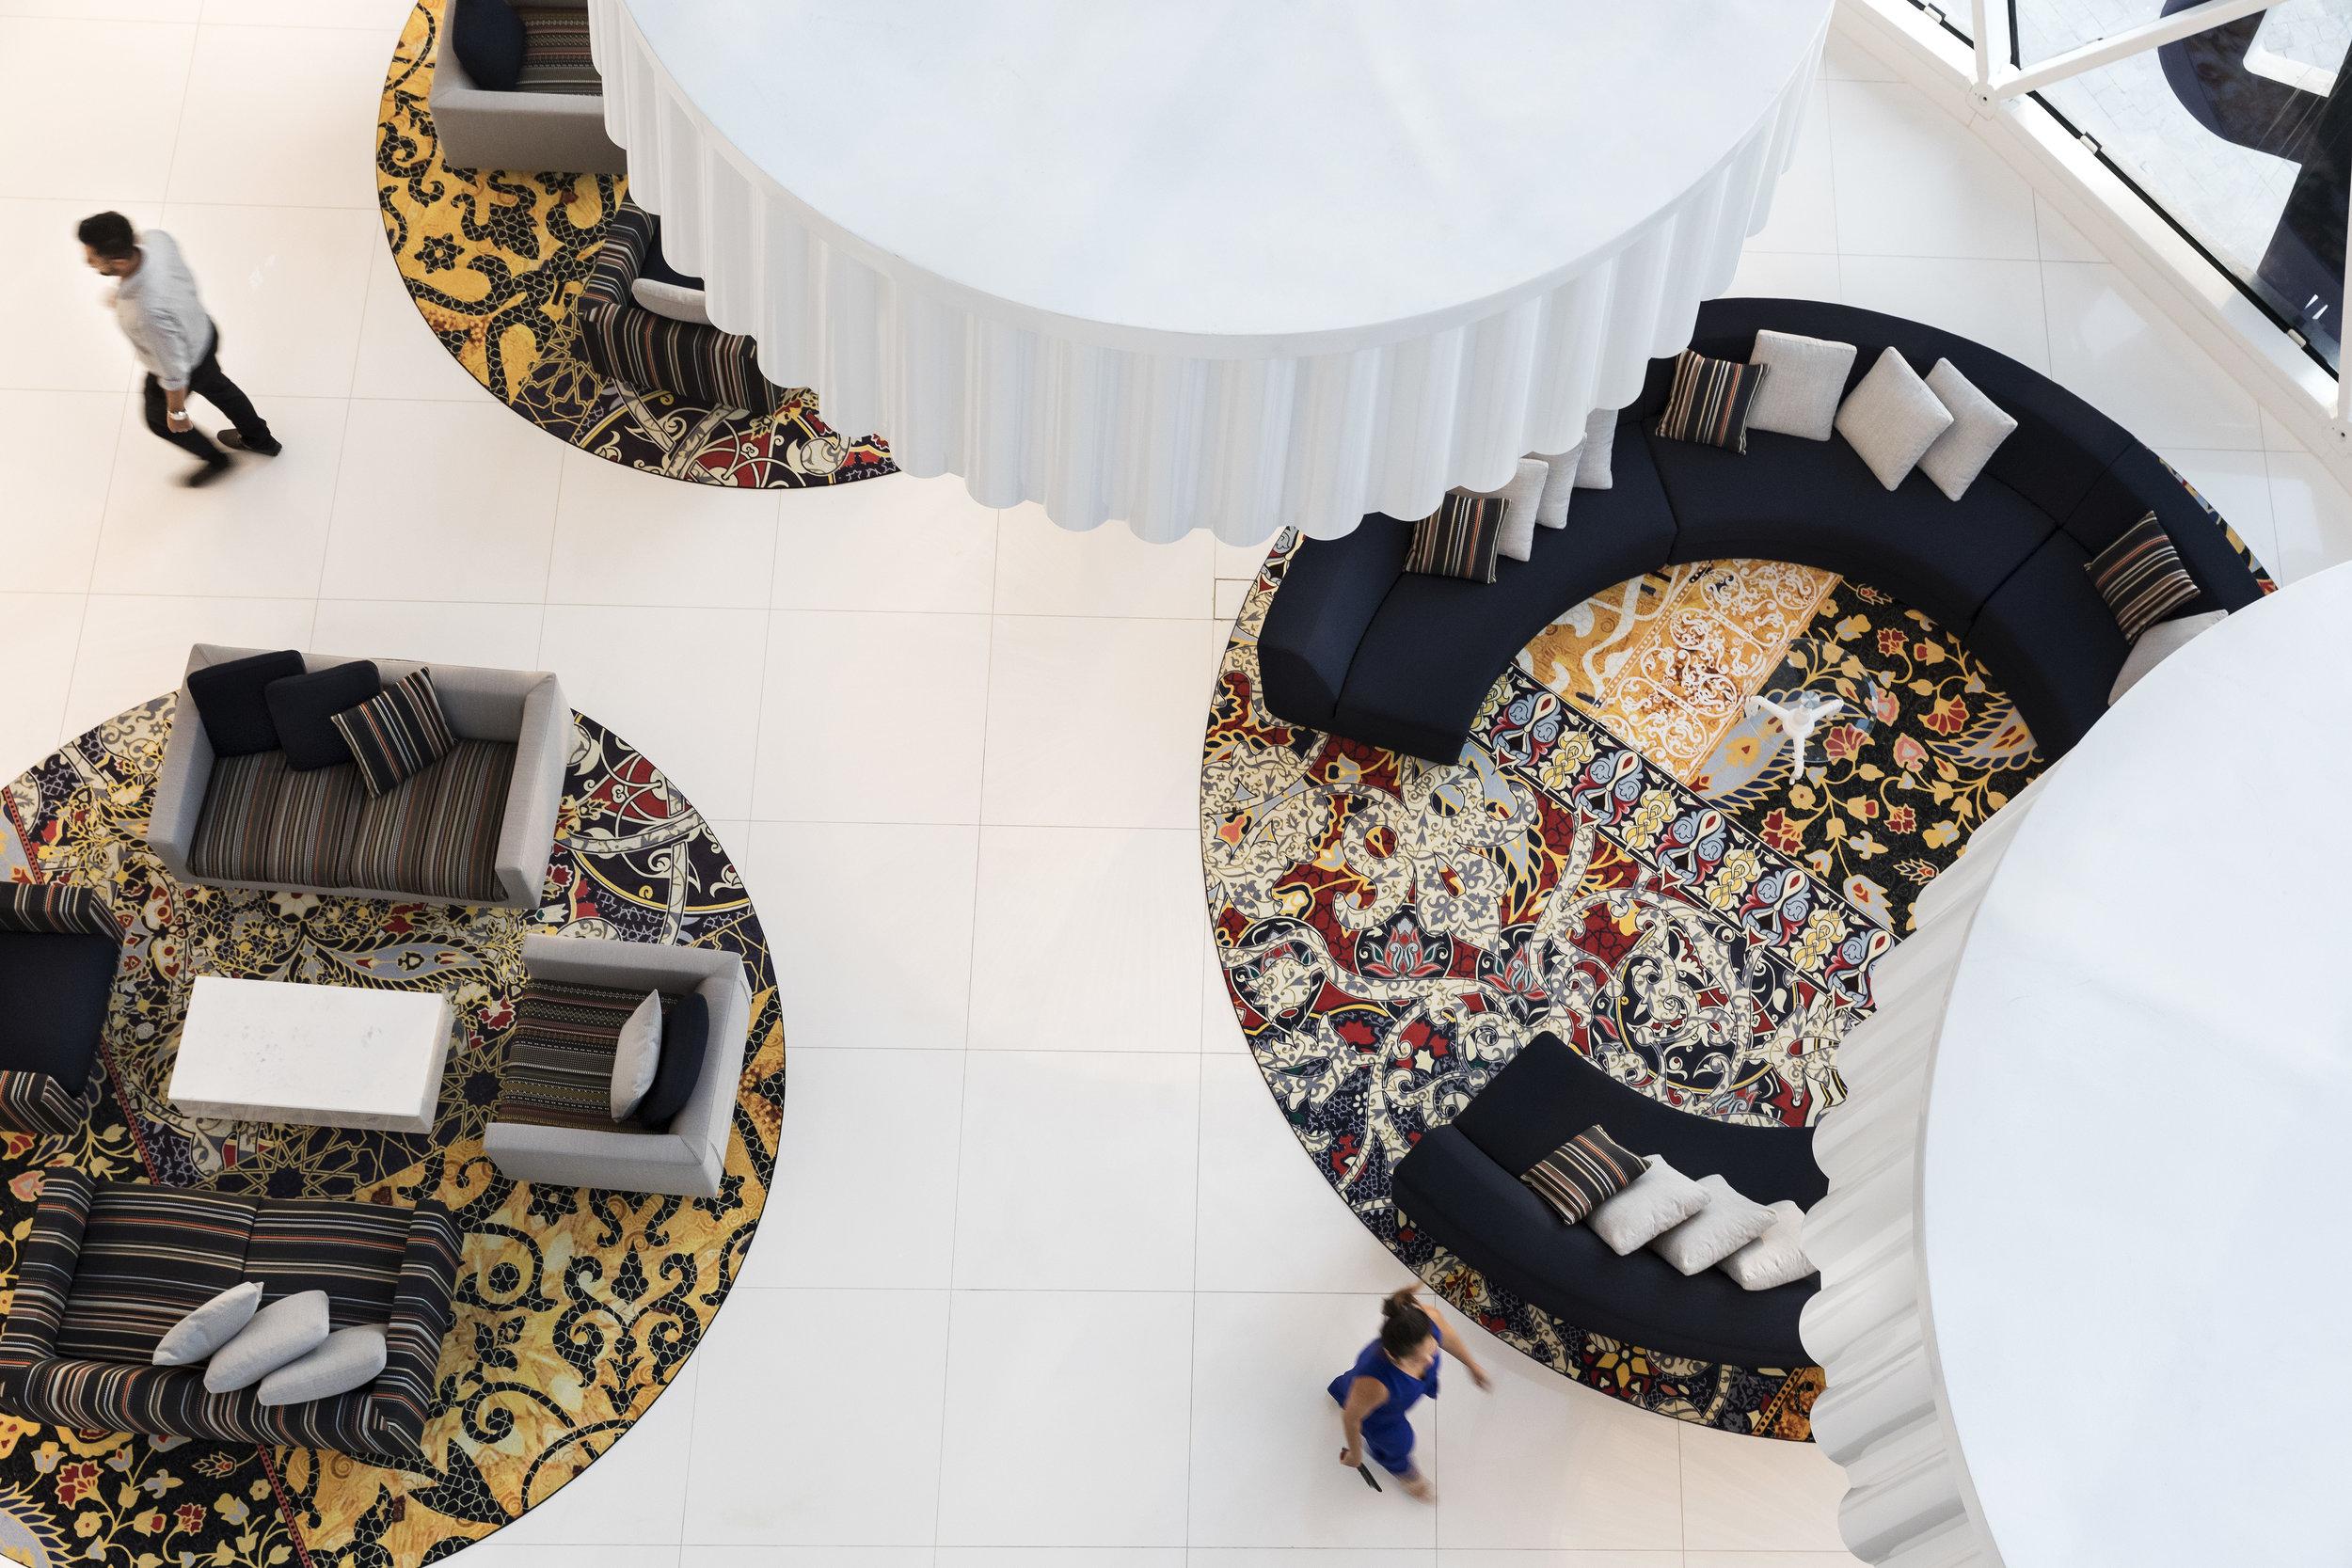 MW_MondrianDoha_atrium_03.jpg